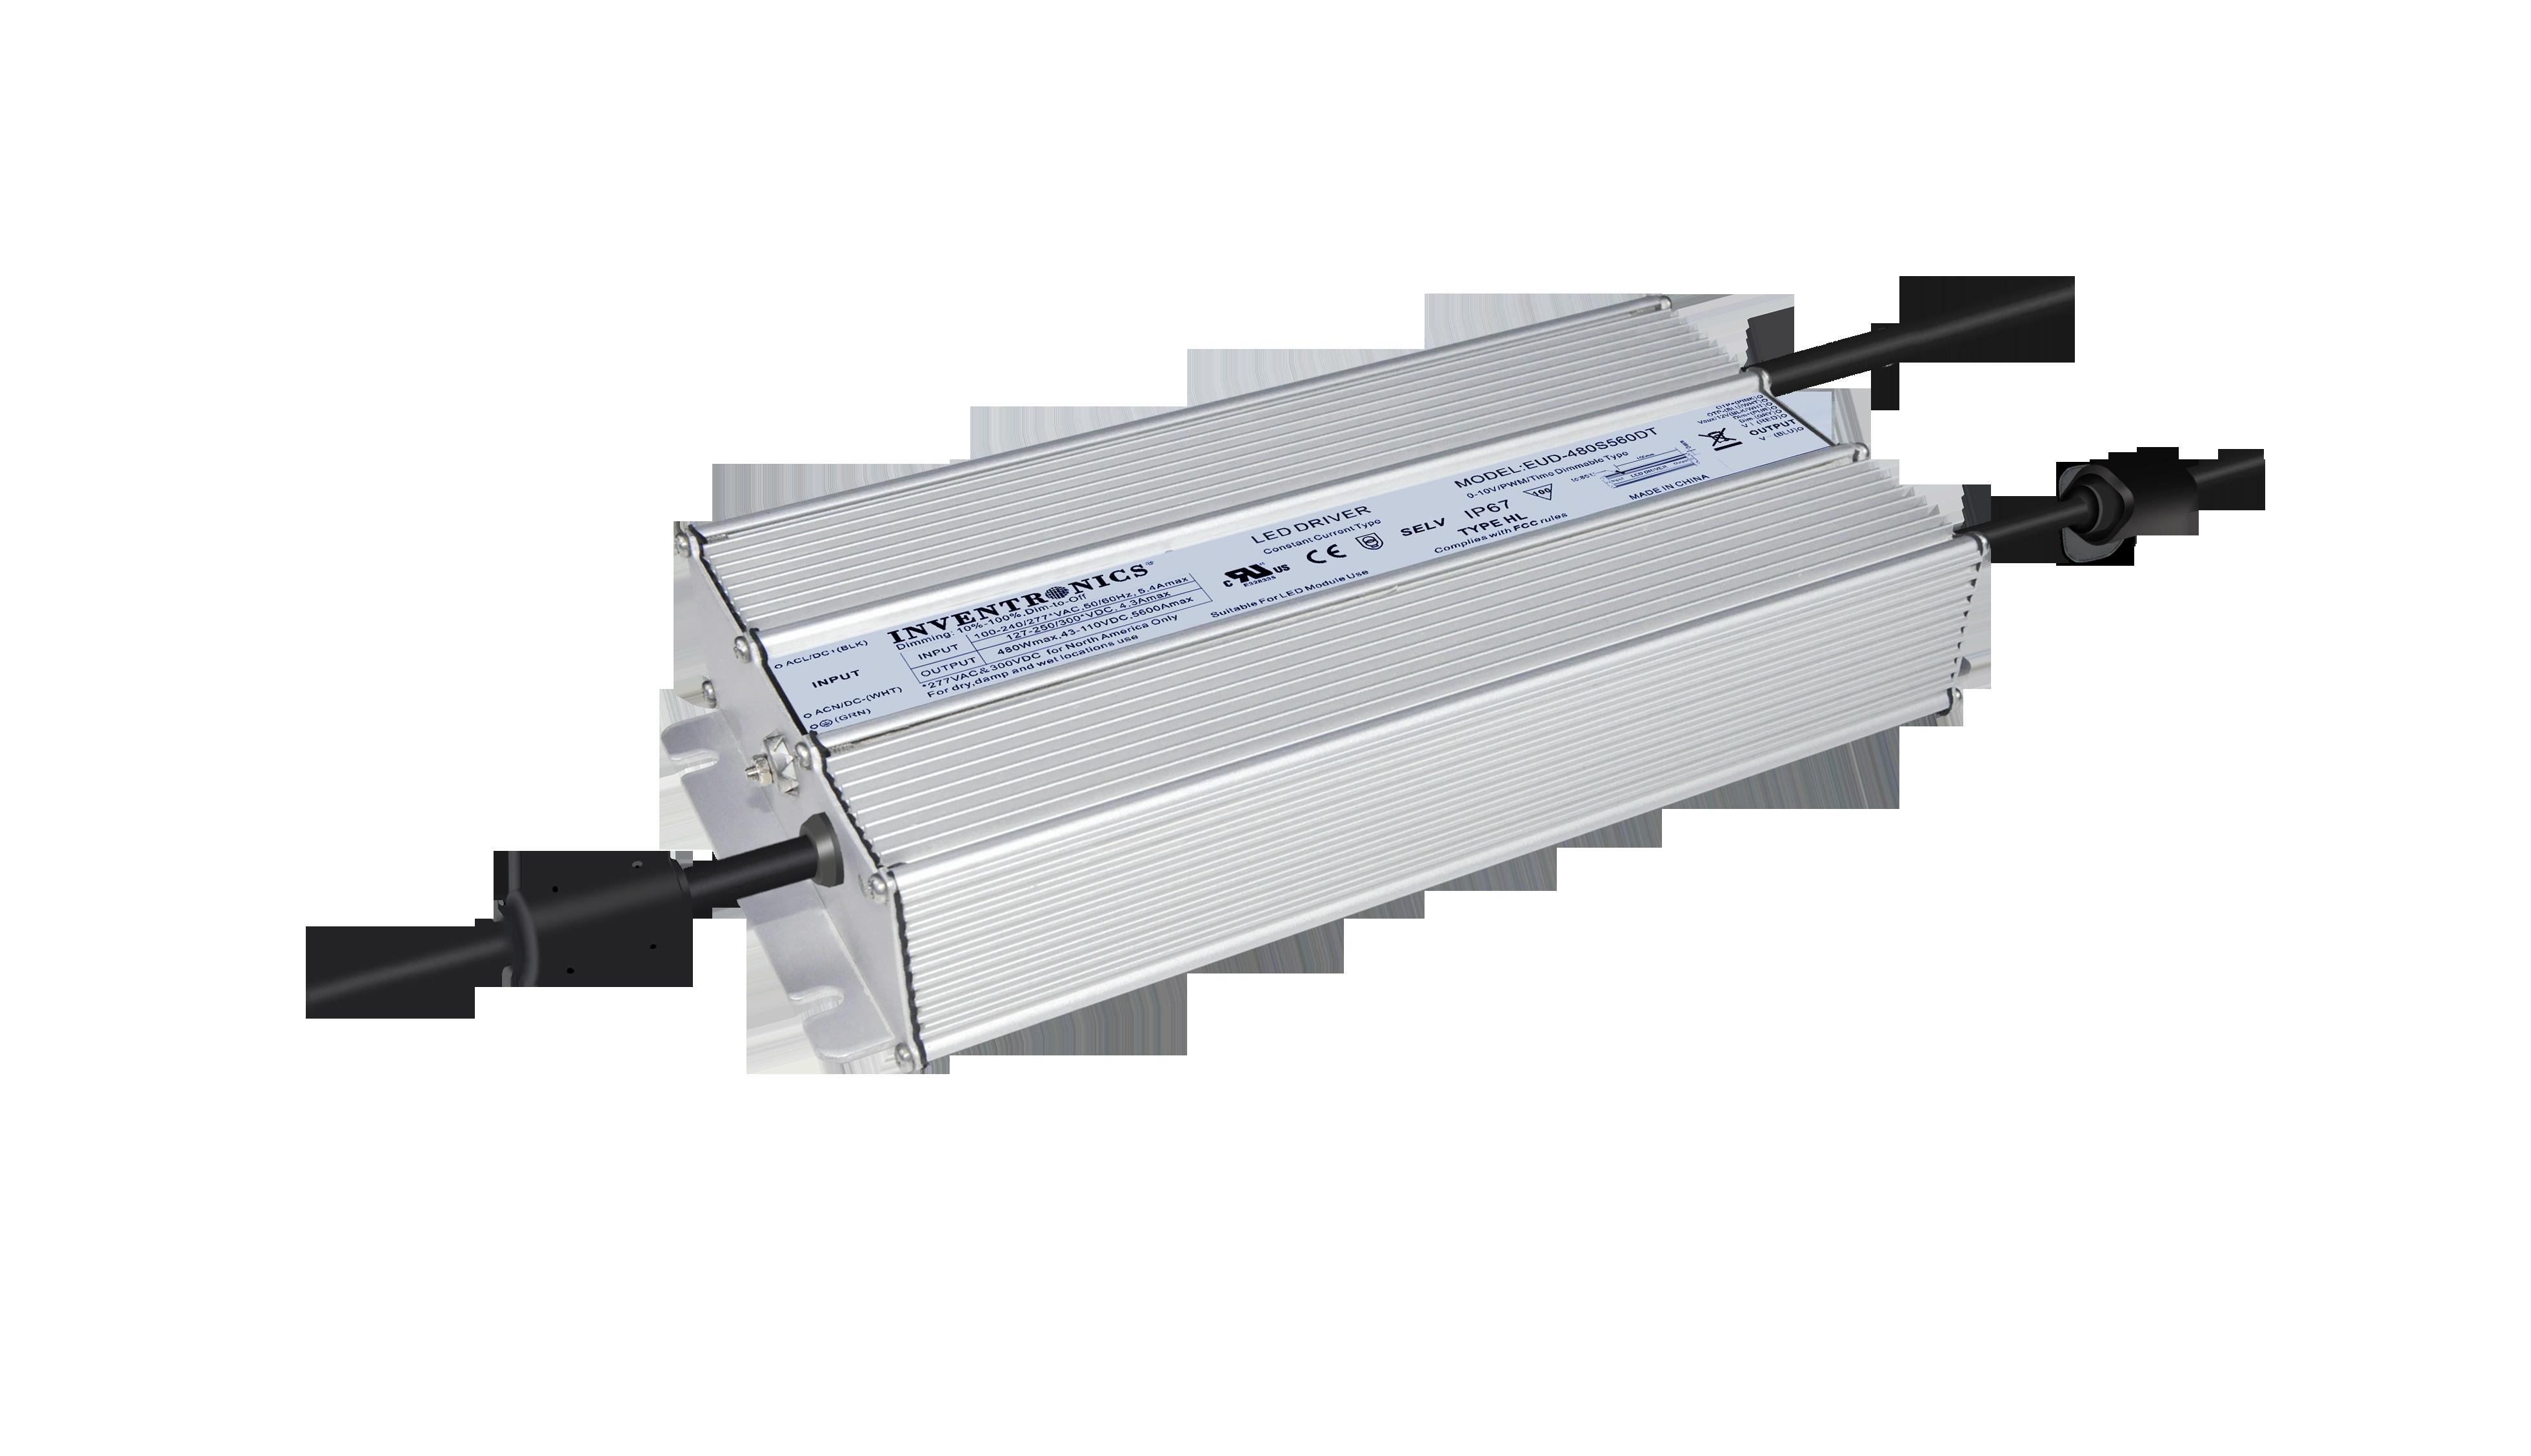 480 Watt Programmable LED Drivers